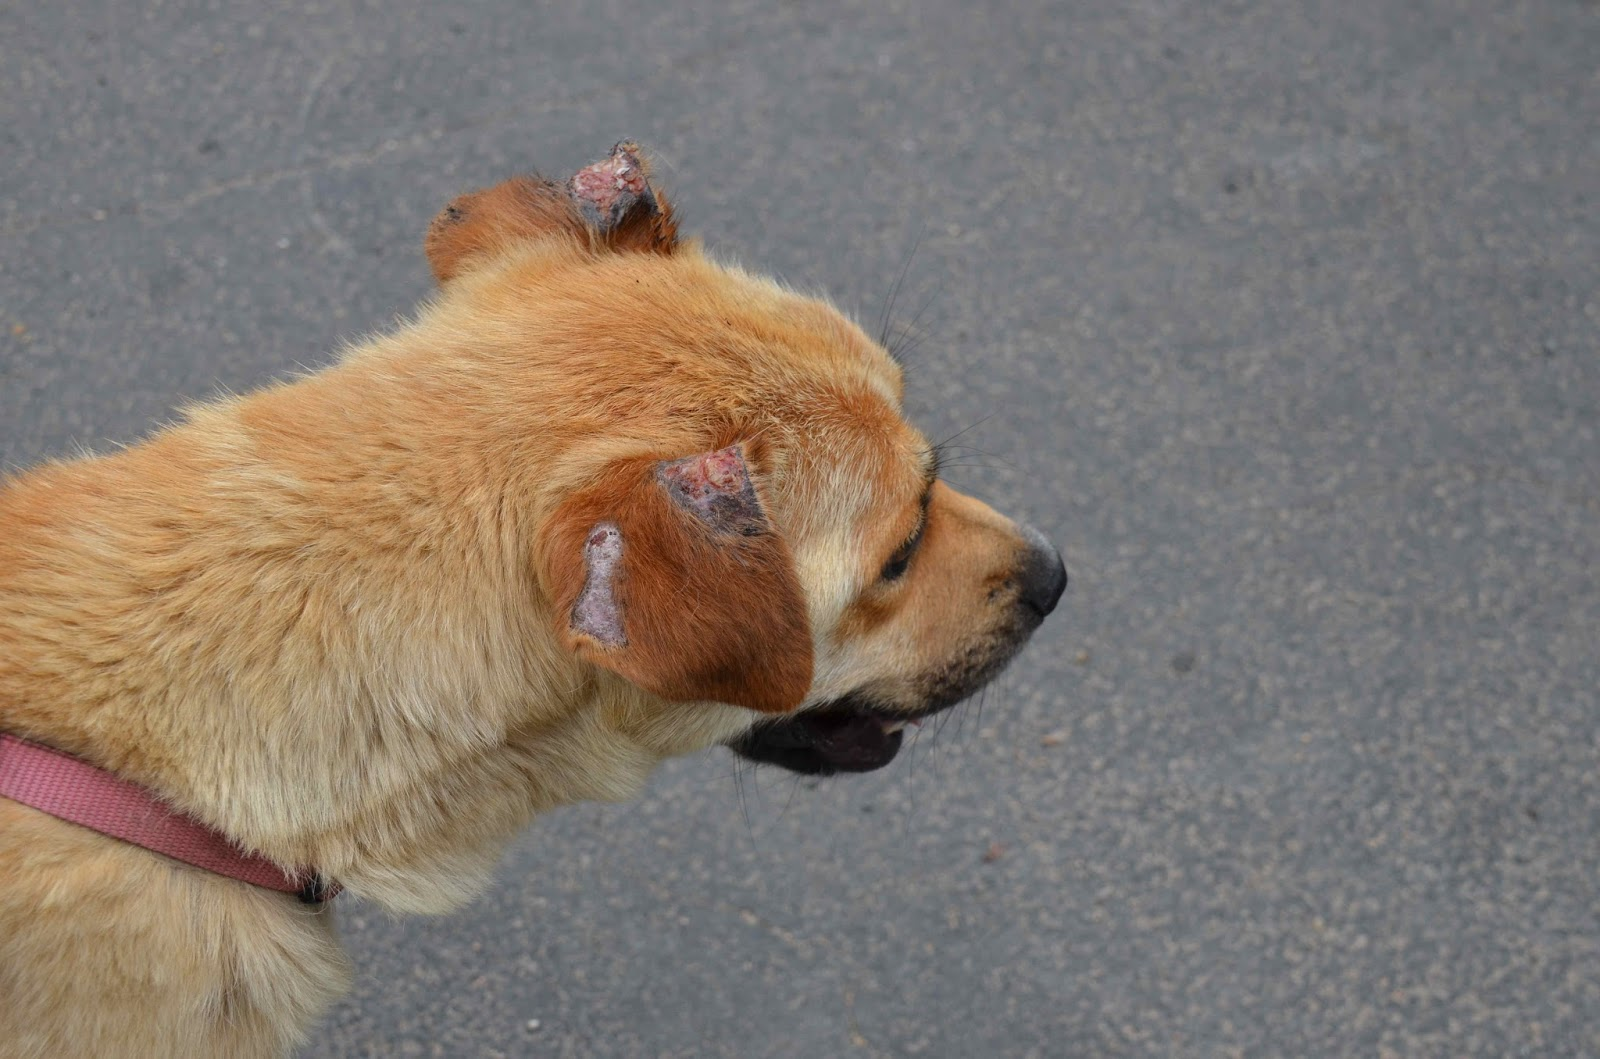 Black Flies That Bite Dogs